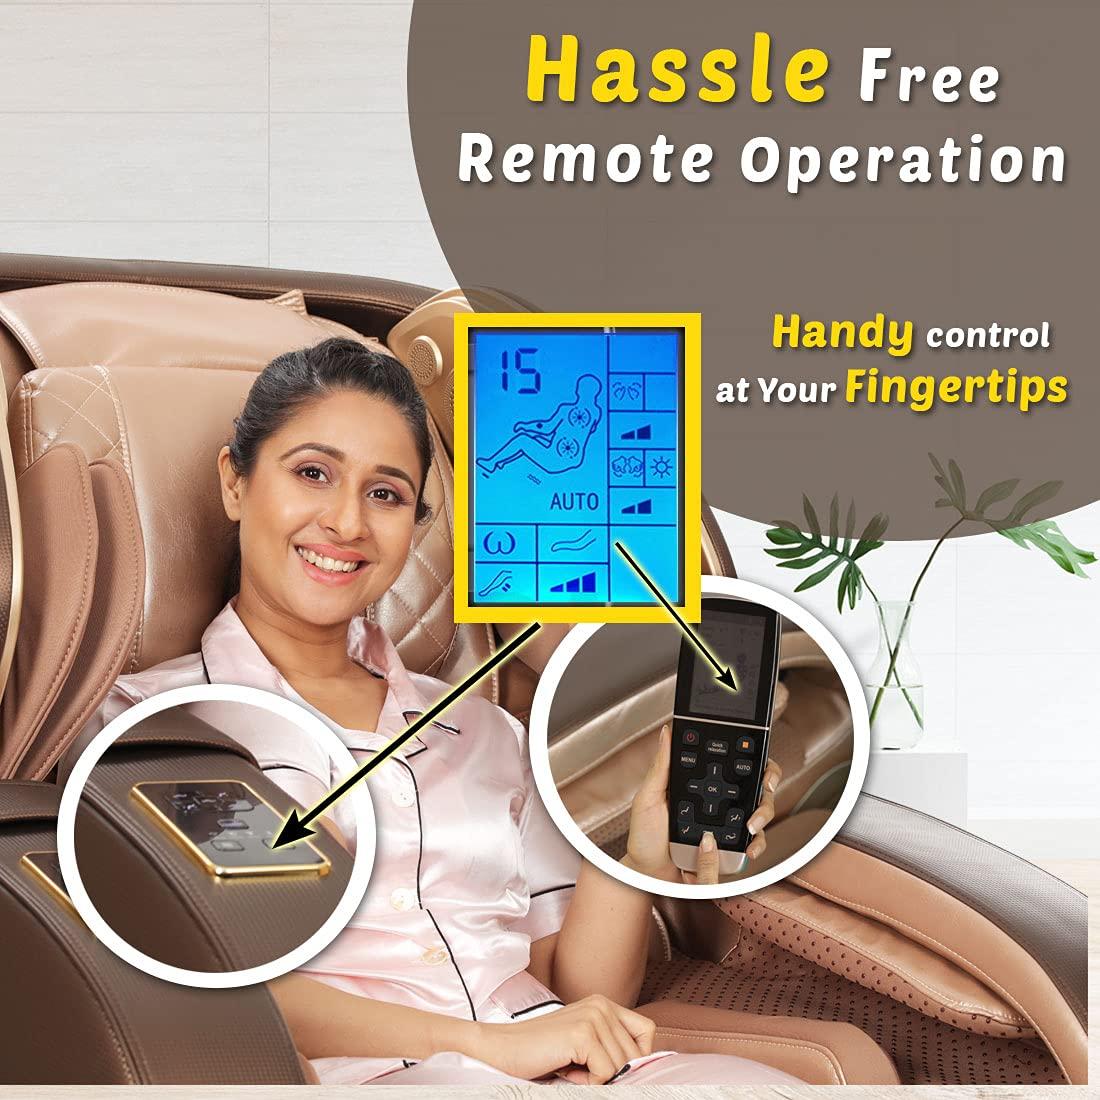 JSB MZ21-Long Recliner 4D Massage Chair for Tall People